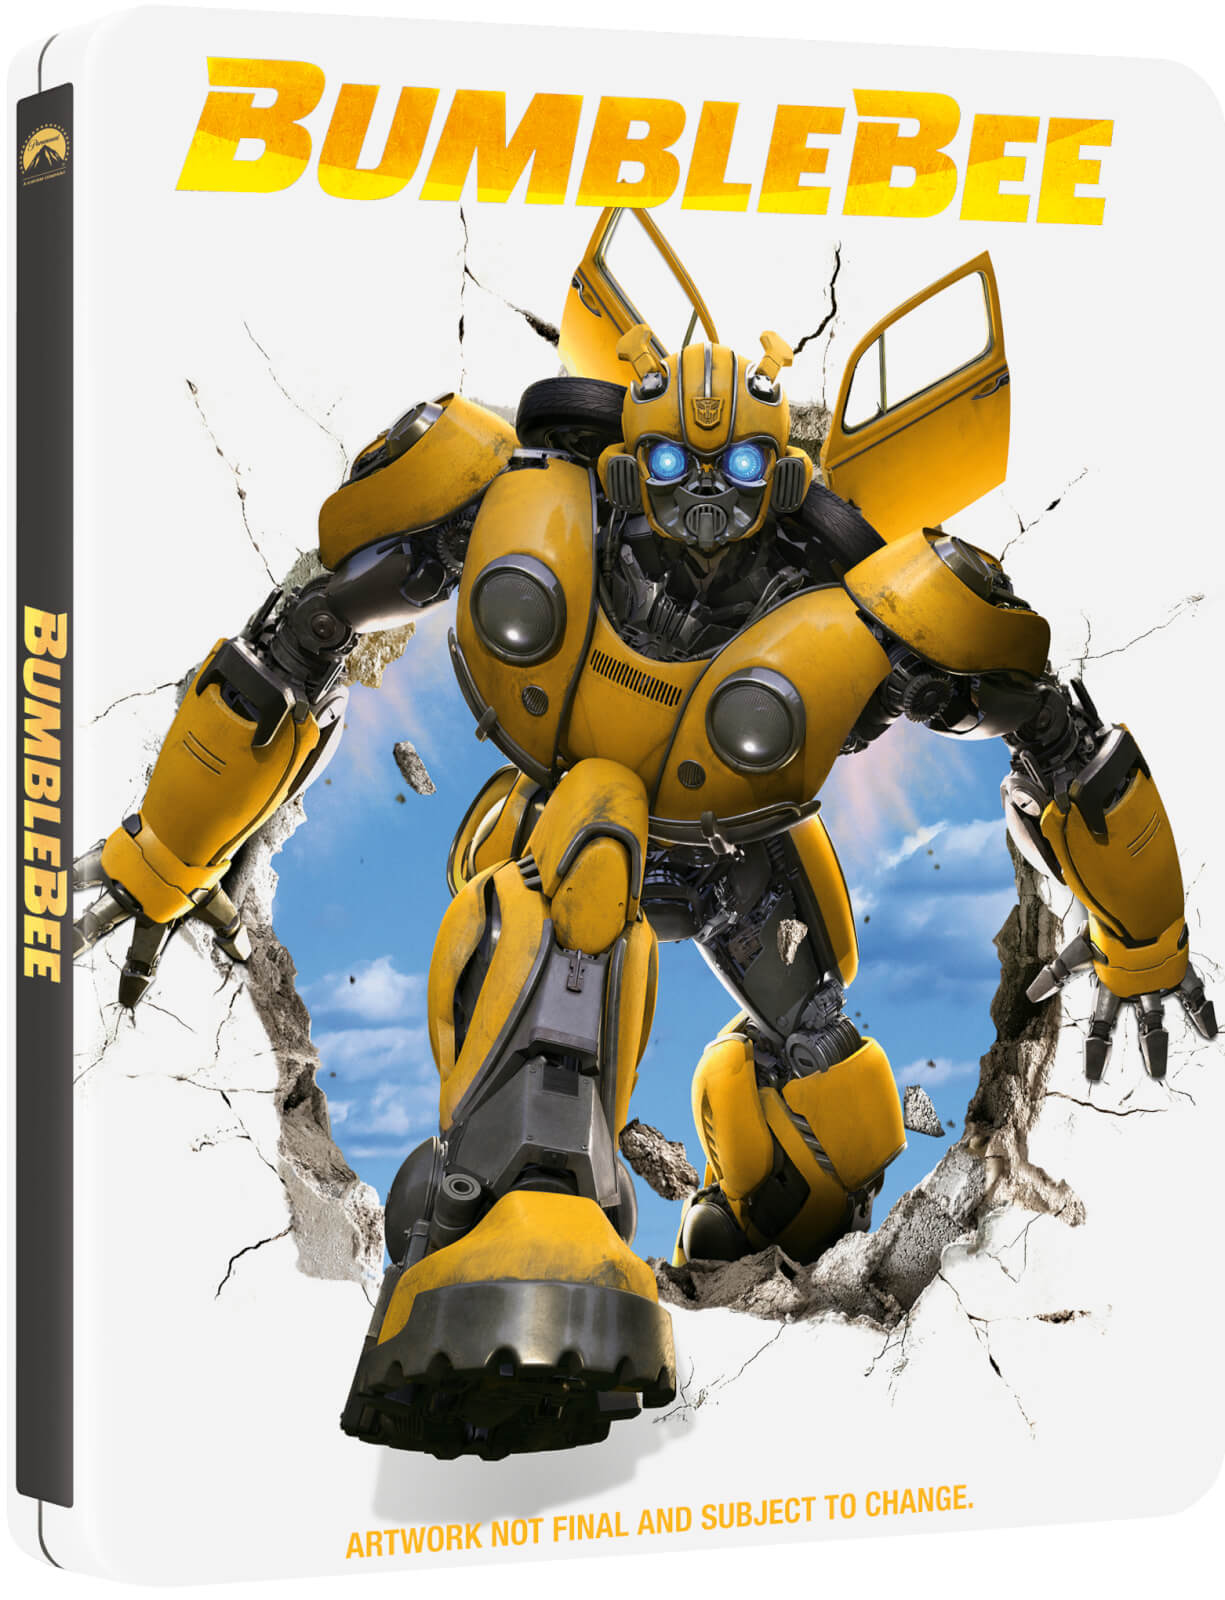 Bumblebee SteelBook temp art